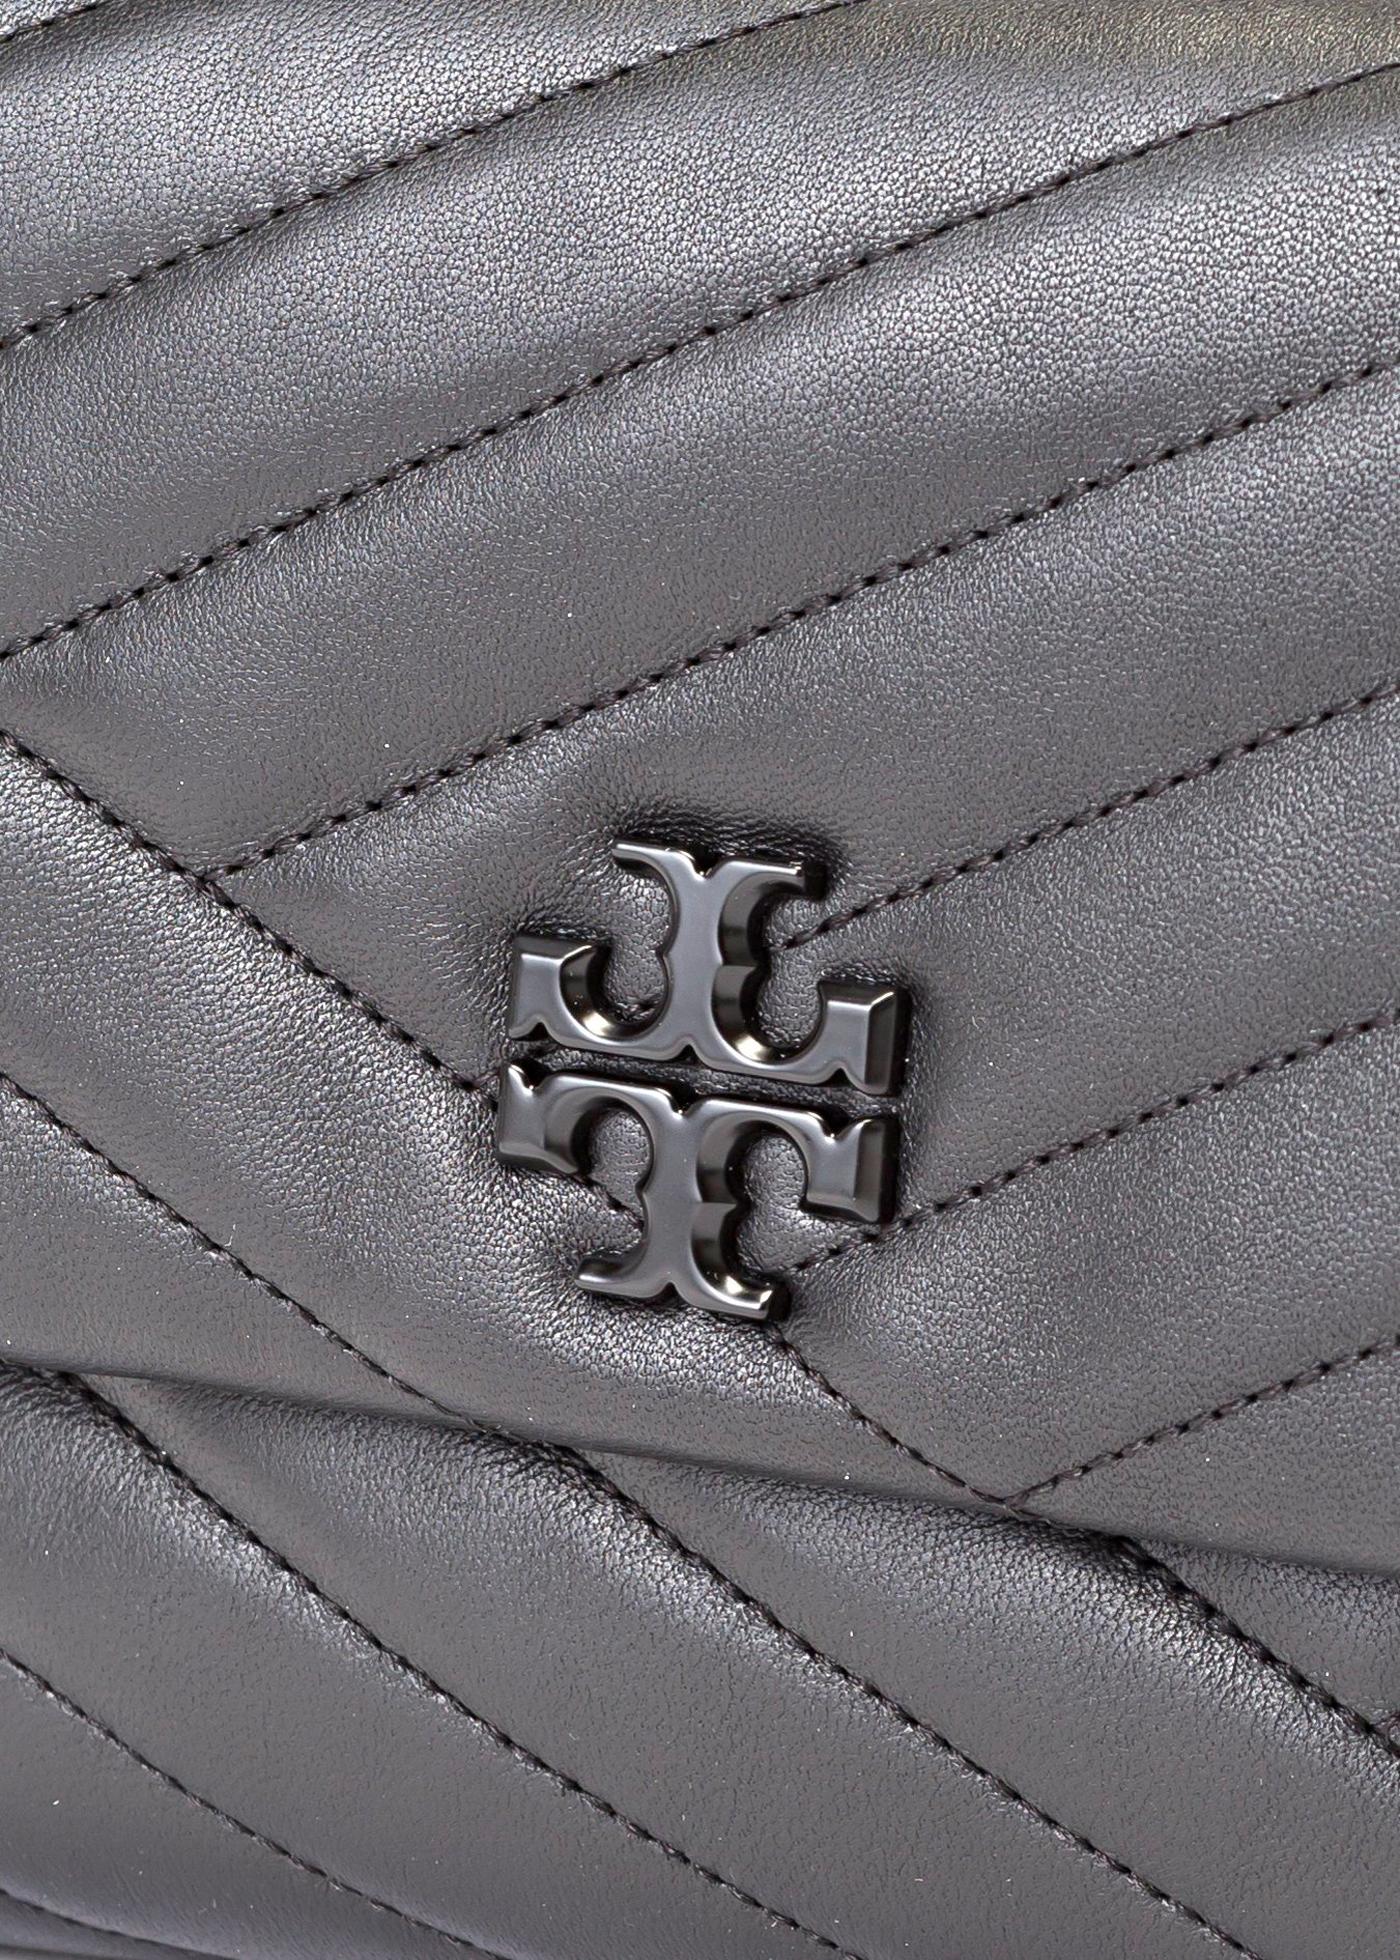 KIRA CHEVRON POWDER COATED SMALL CONVERTIBLE SHOULDER BAG image number 2